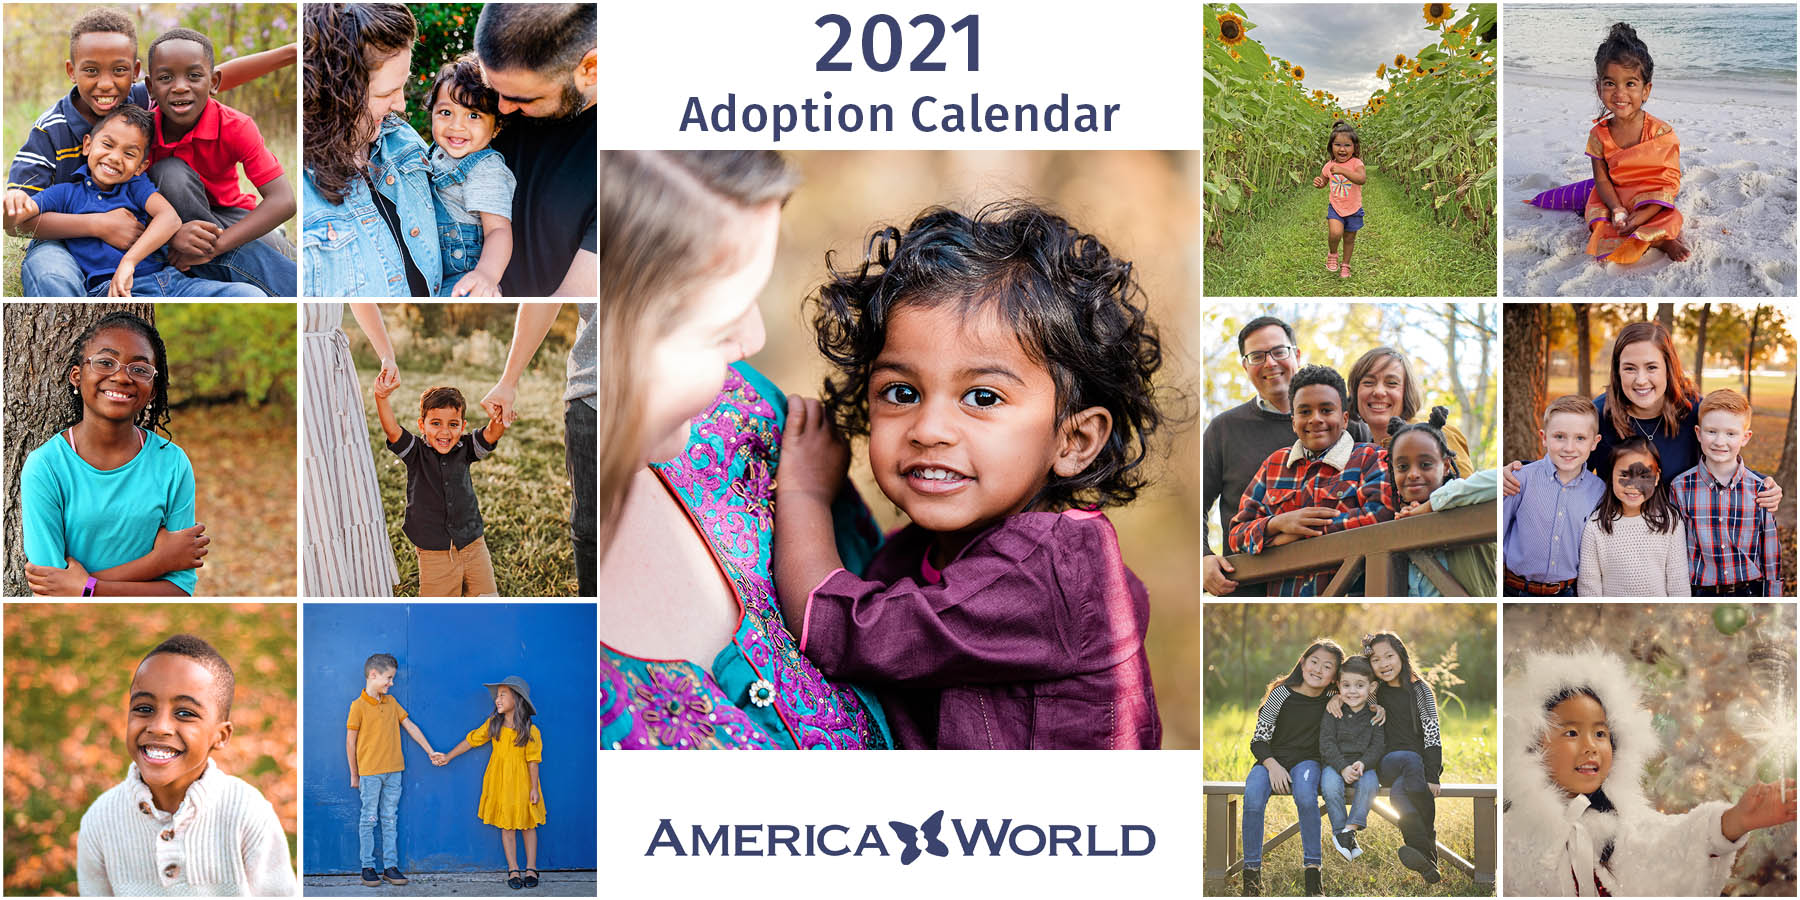 2021 Adoption Calendar Winners